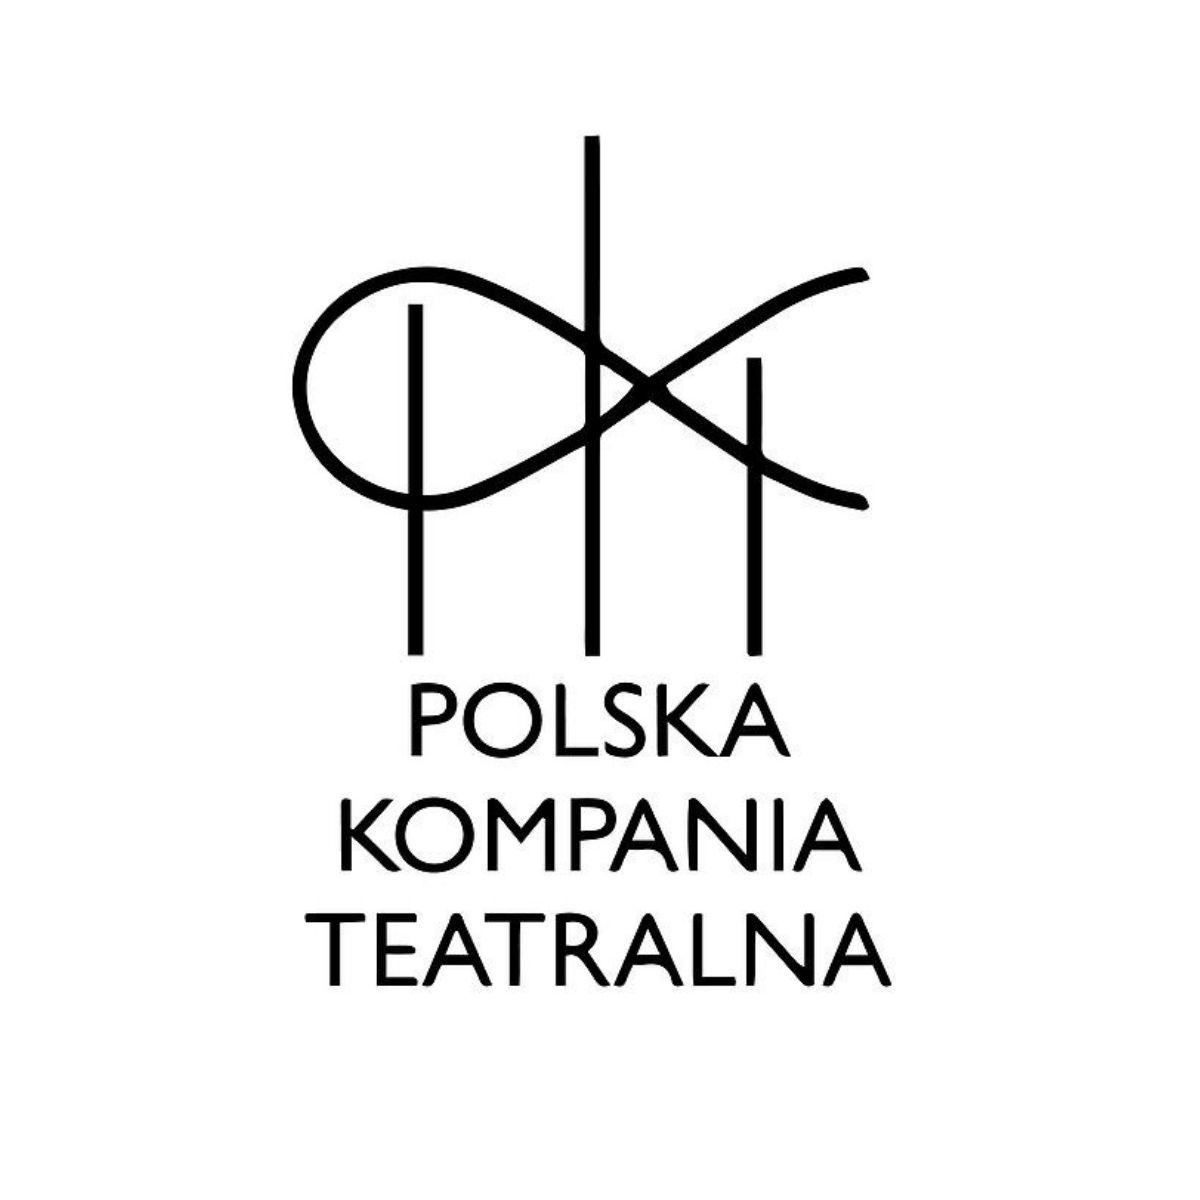 Logo: Polska Kompania Teatralna